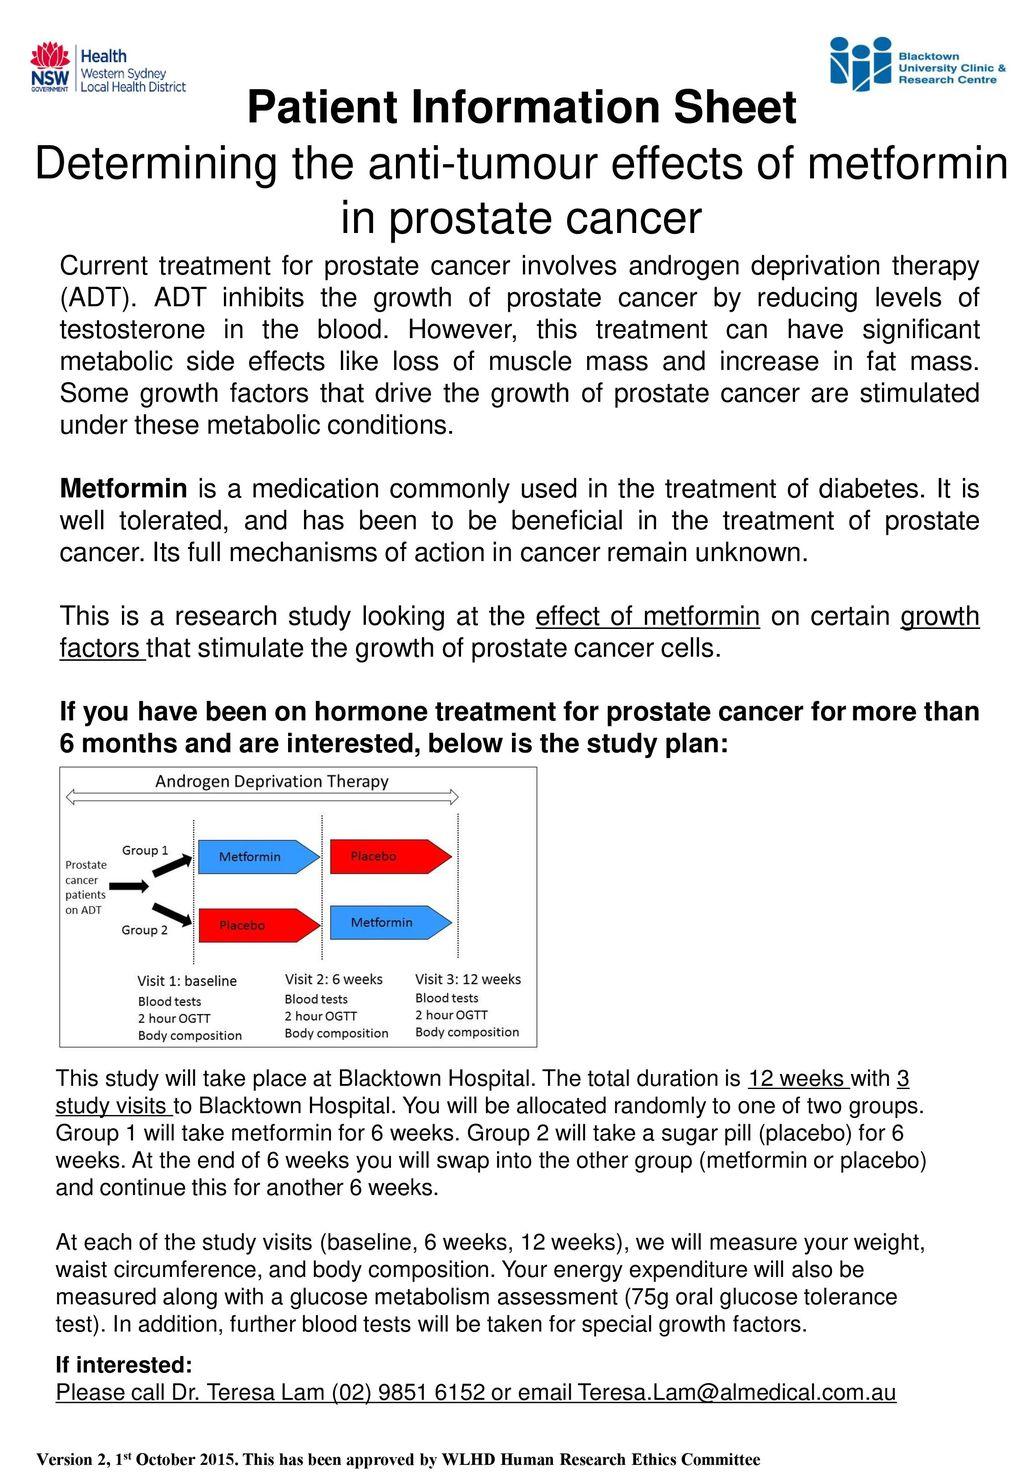 Patient Information Sheet - ppt download